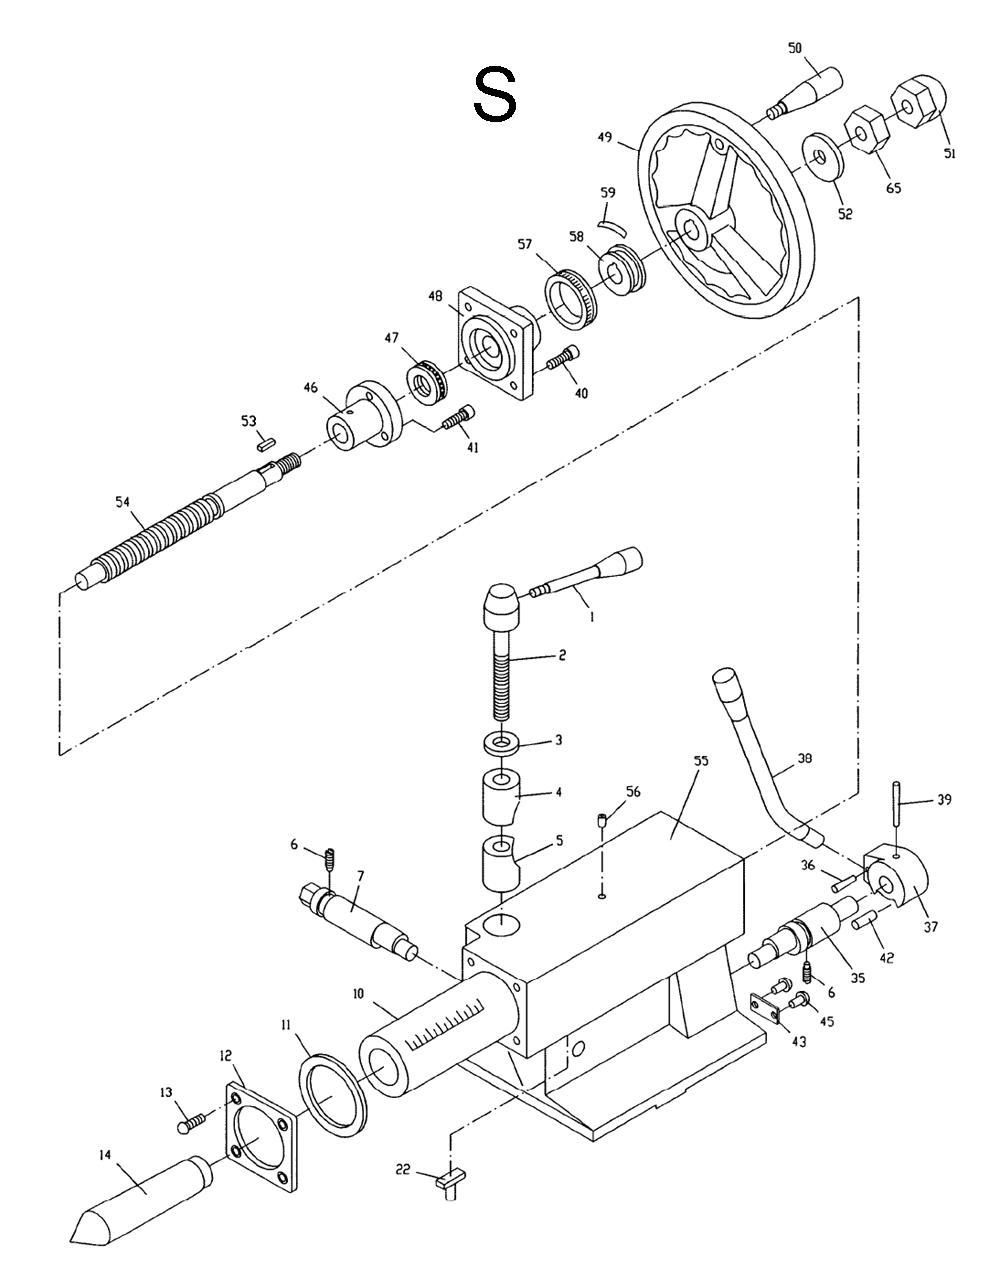 321313-jet-PB-19Break Down